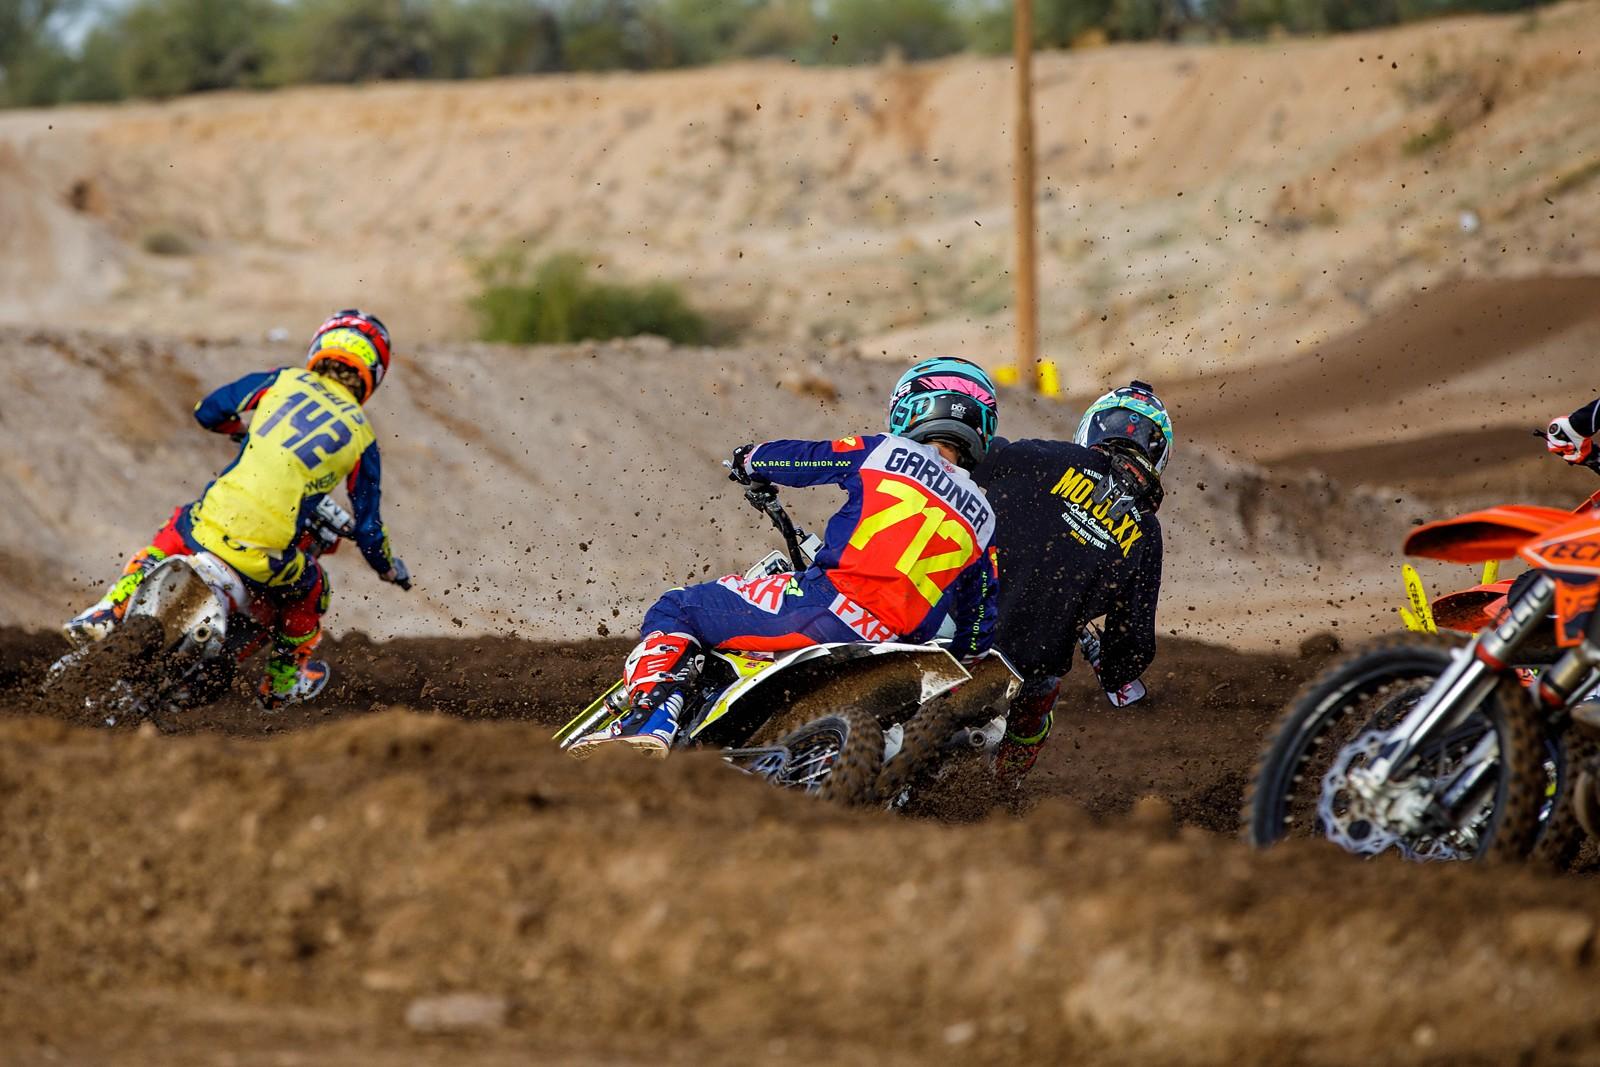 Conditions - AZ Open of Motocross, Part 2 - Motocross Pictures - Vital MX